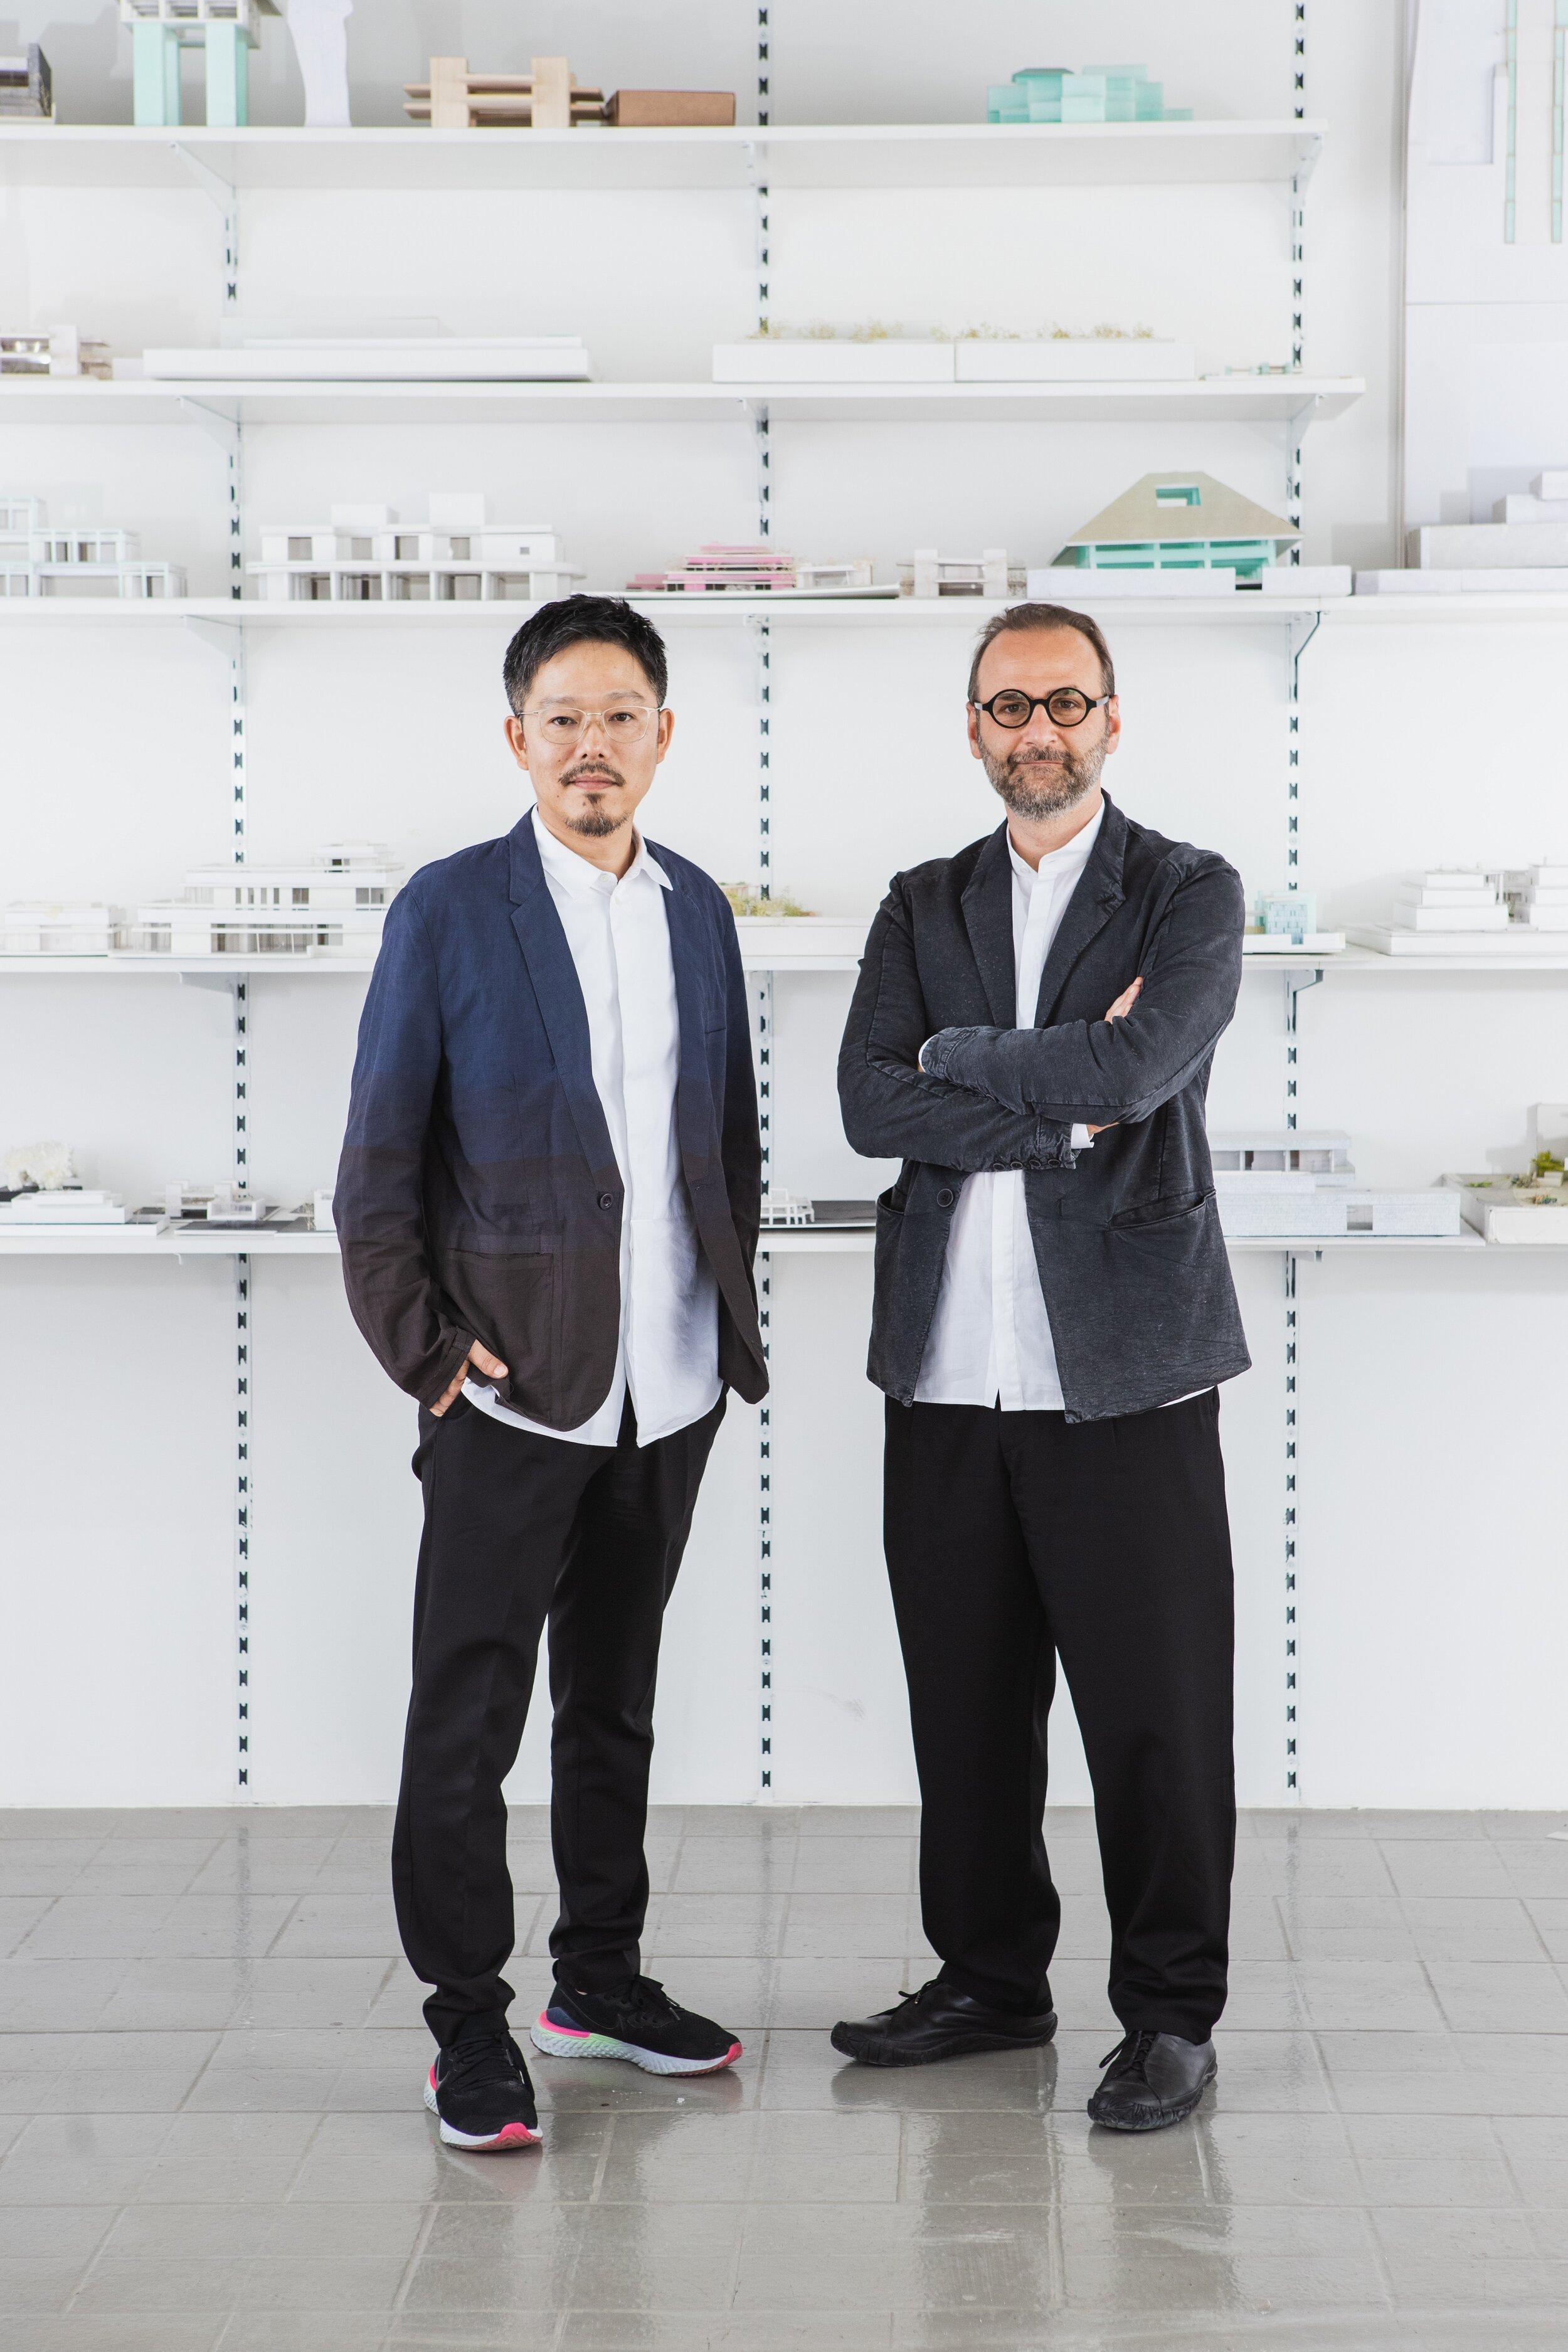 Wael Al Awar and Kenichi Teramoto. Image courtesy of National Pavilion UAE - La Biennale di Venezia.